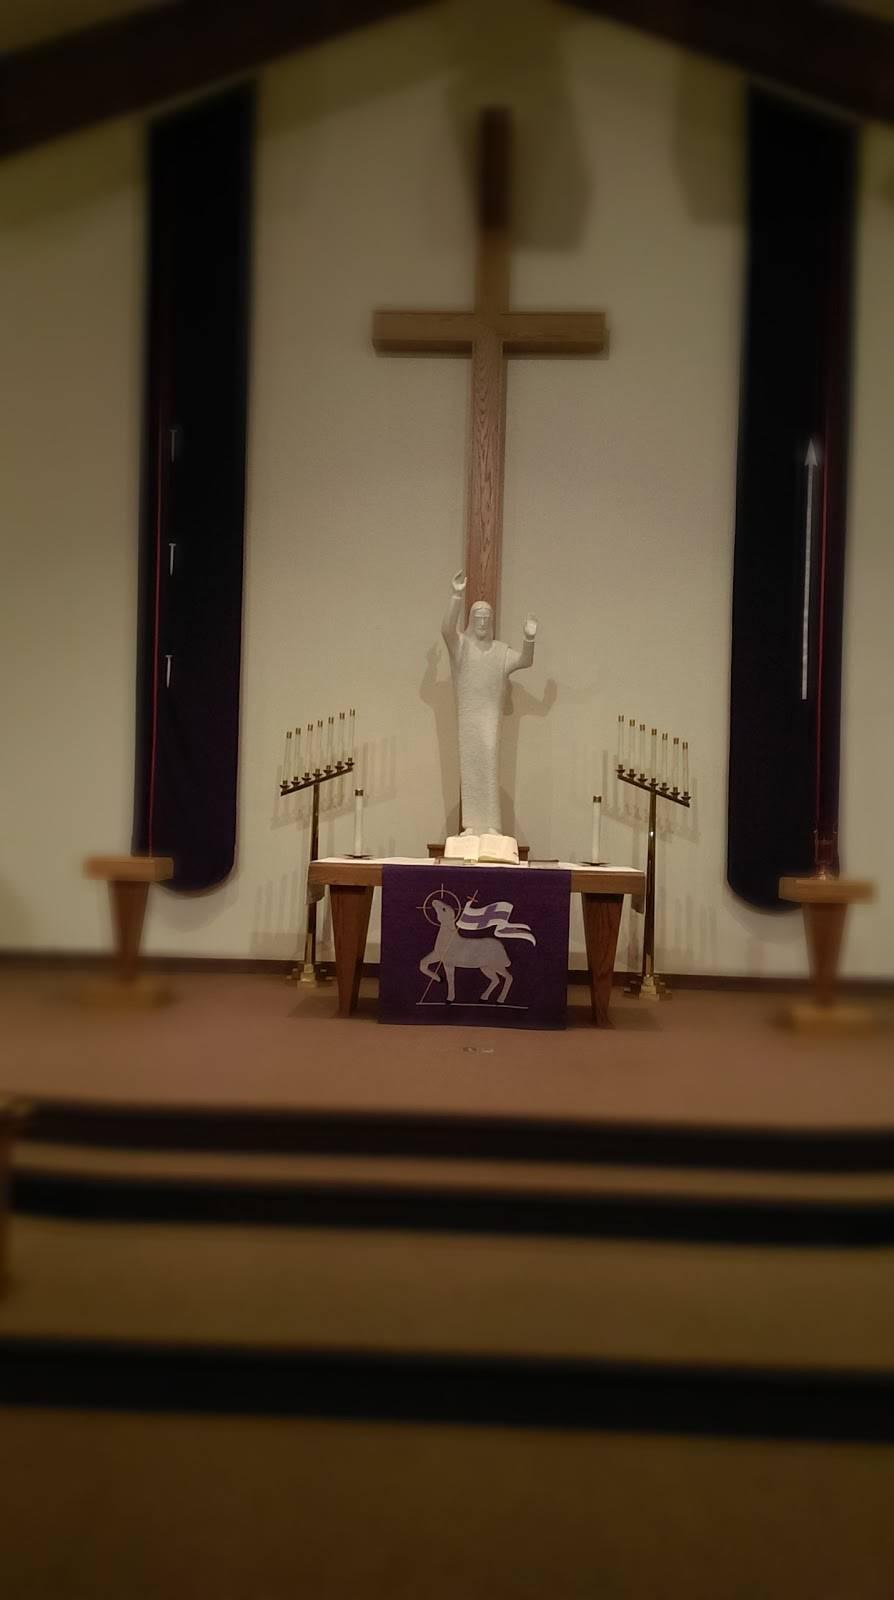 Prince-Peace Lutheran Church - church    Photo 3 of 3   Address: 7700 Monroe St NE, Minneapolis, MN 55432, USA   Phone: (763) 786-1706